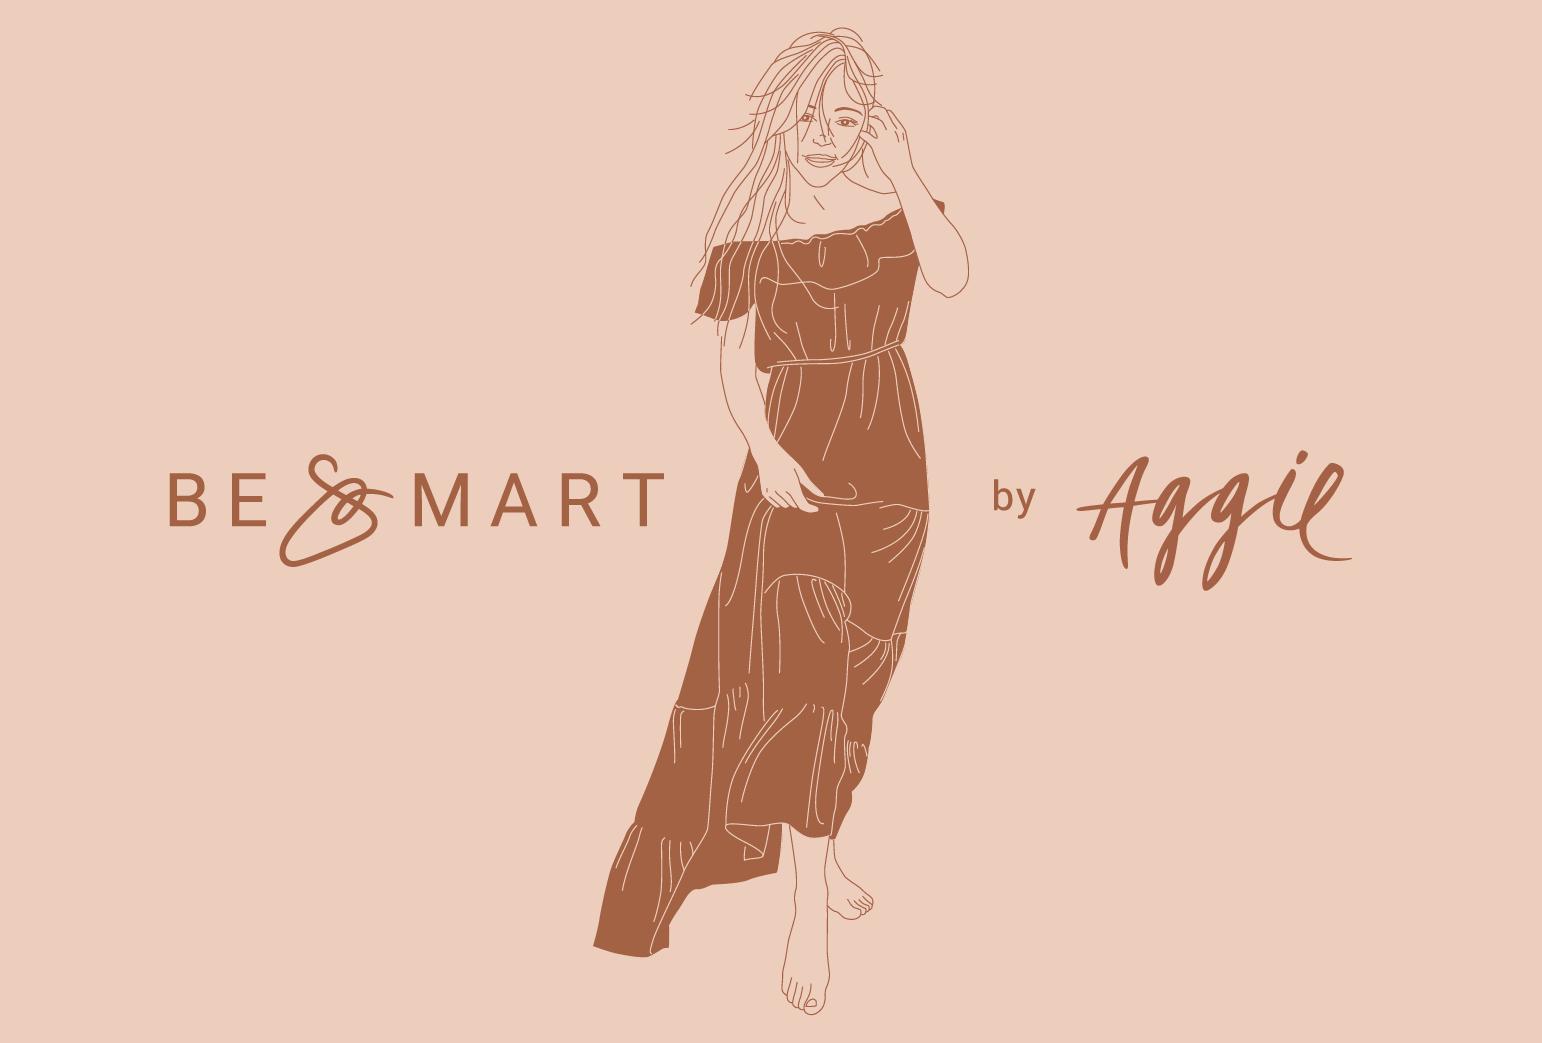 Besmart by Aggie